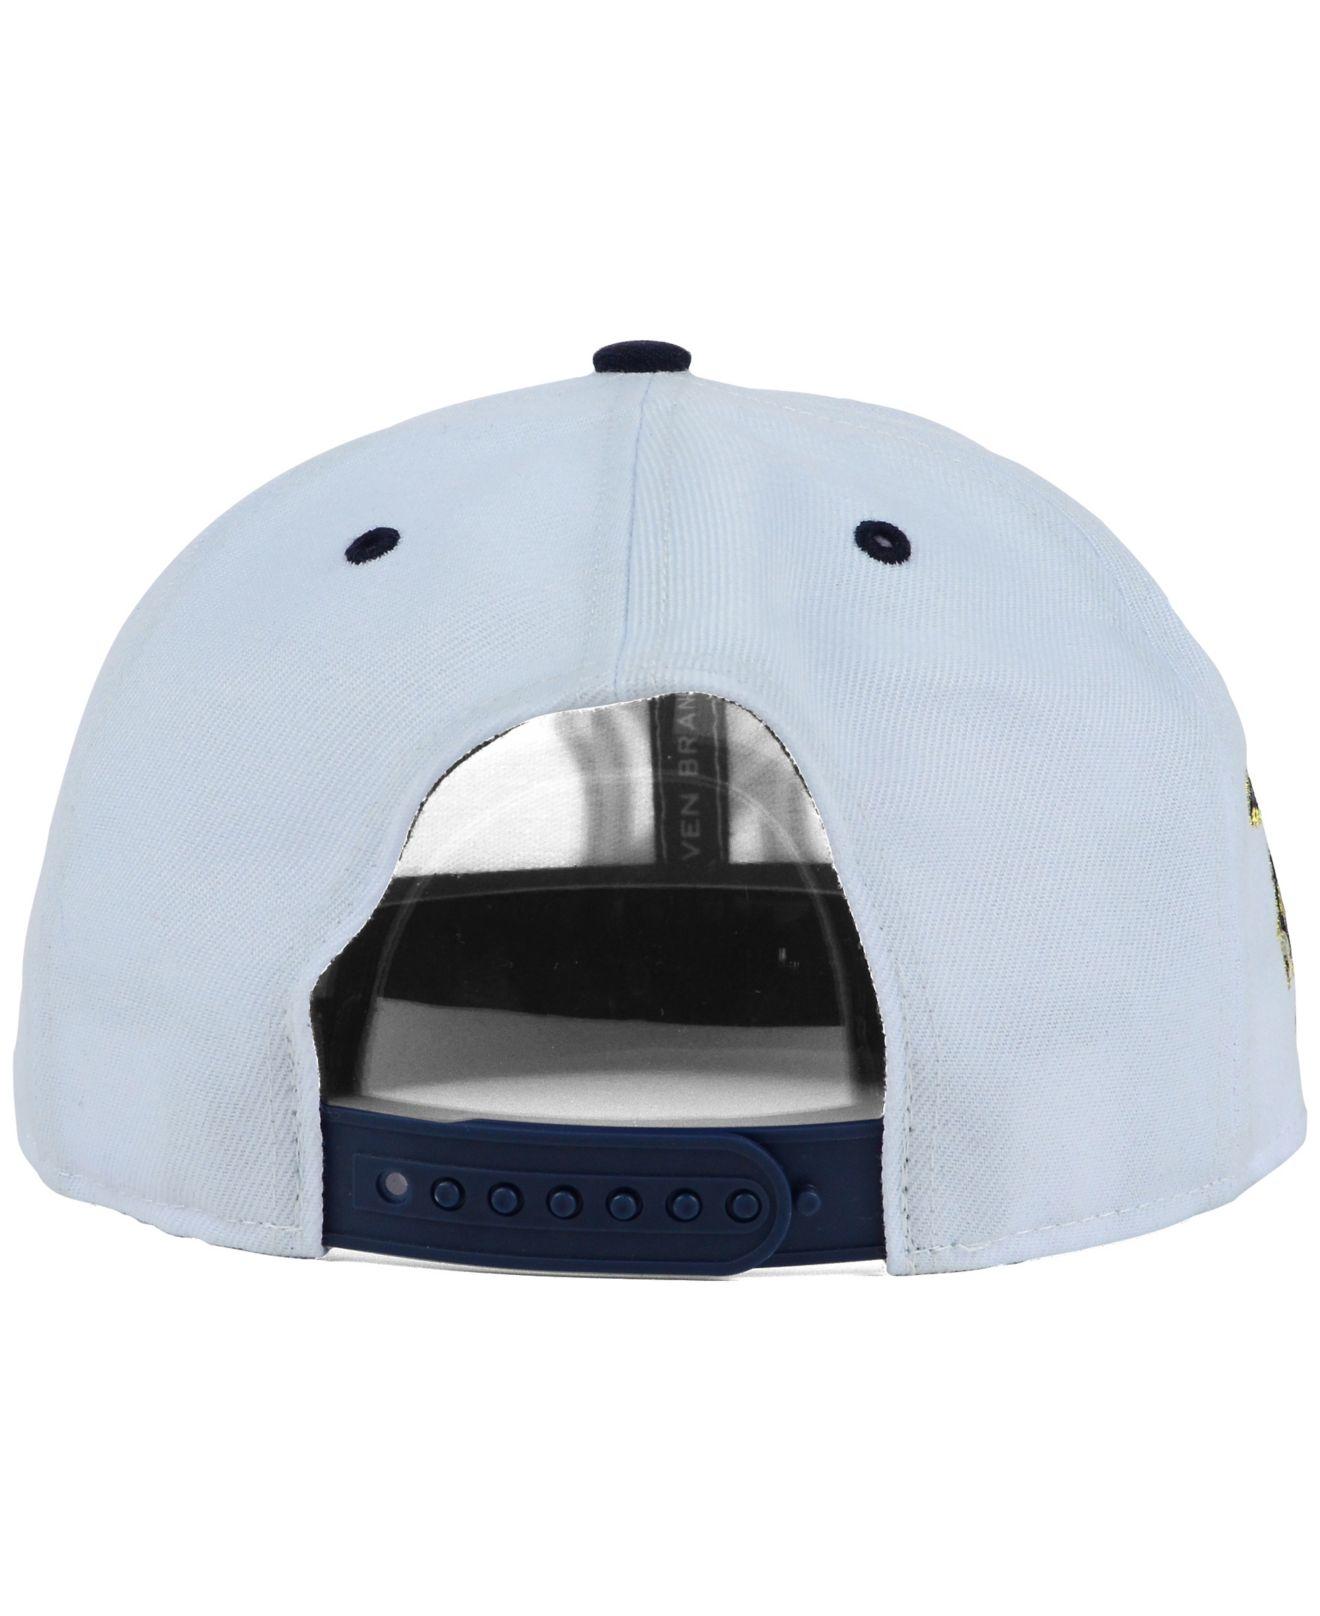 100% authentic 2da07 4b2ec ... lyst 47 brand new york yankees gold rush snapback cap in white for men